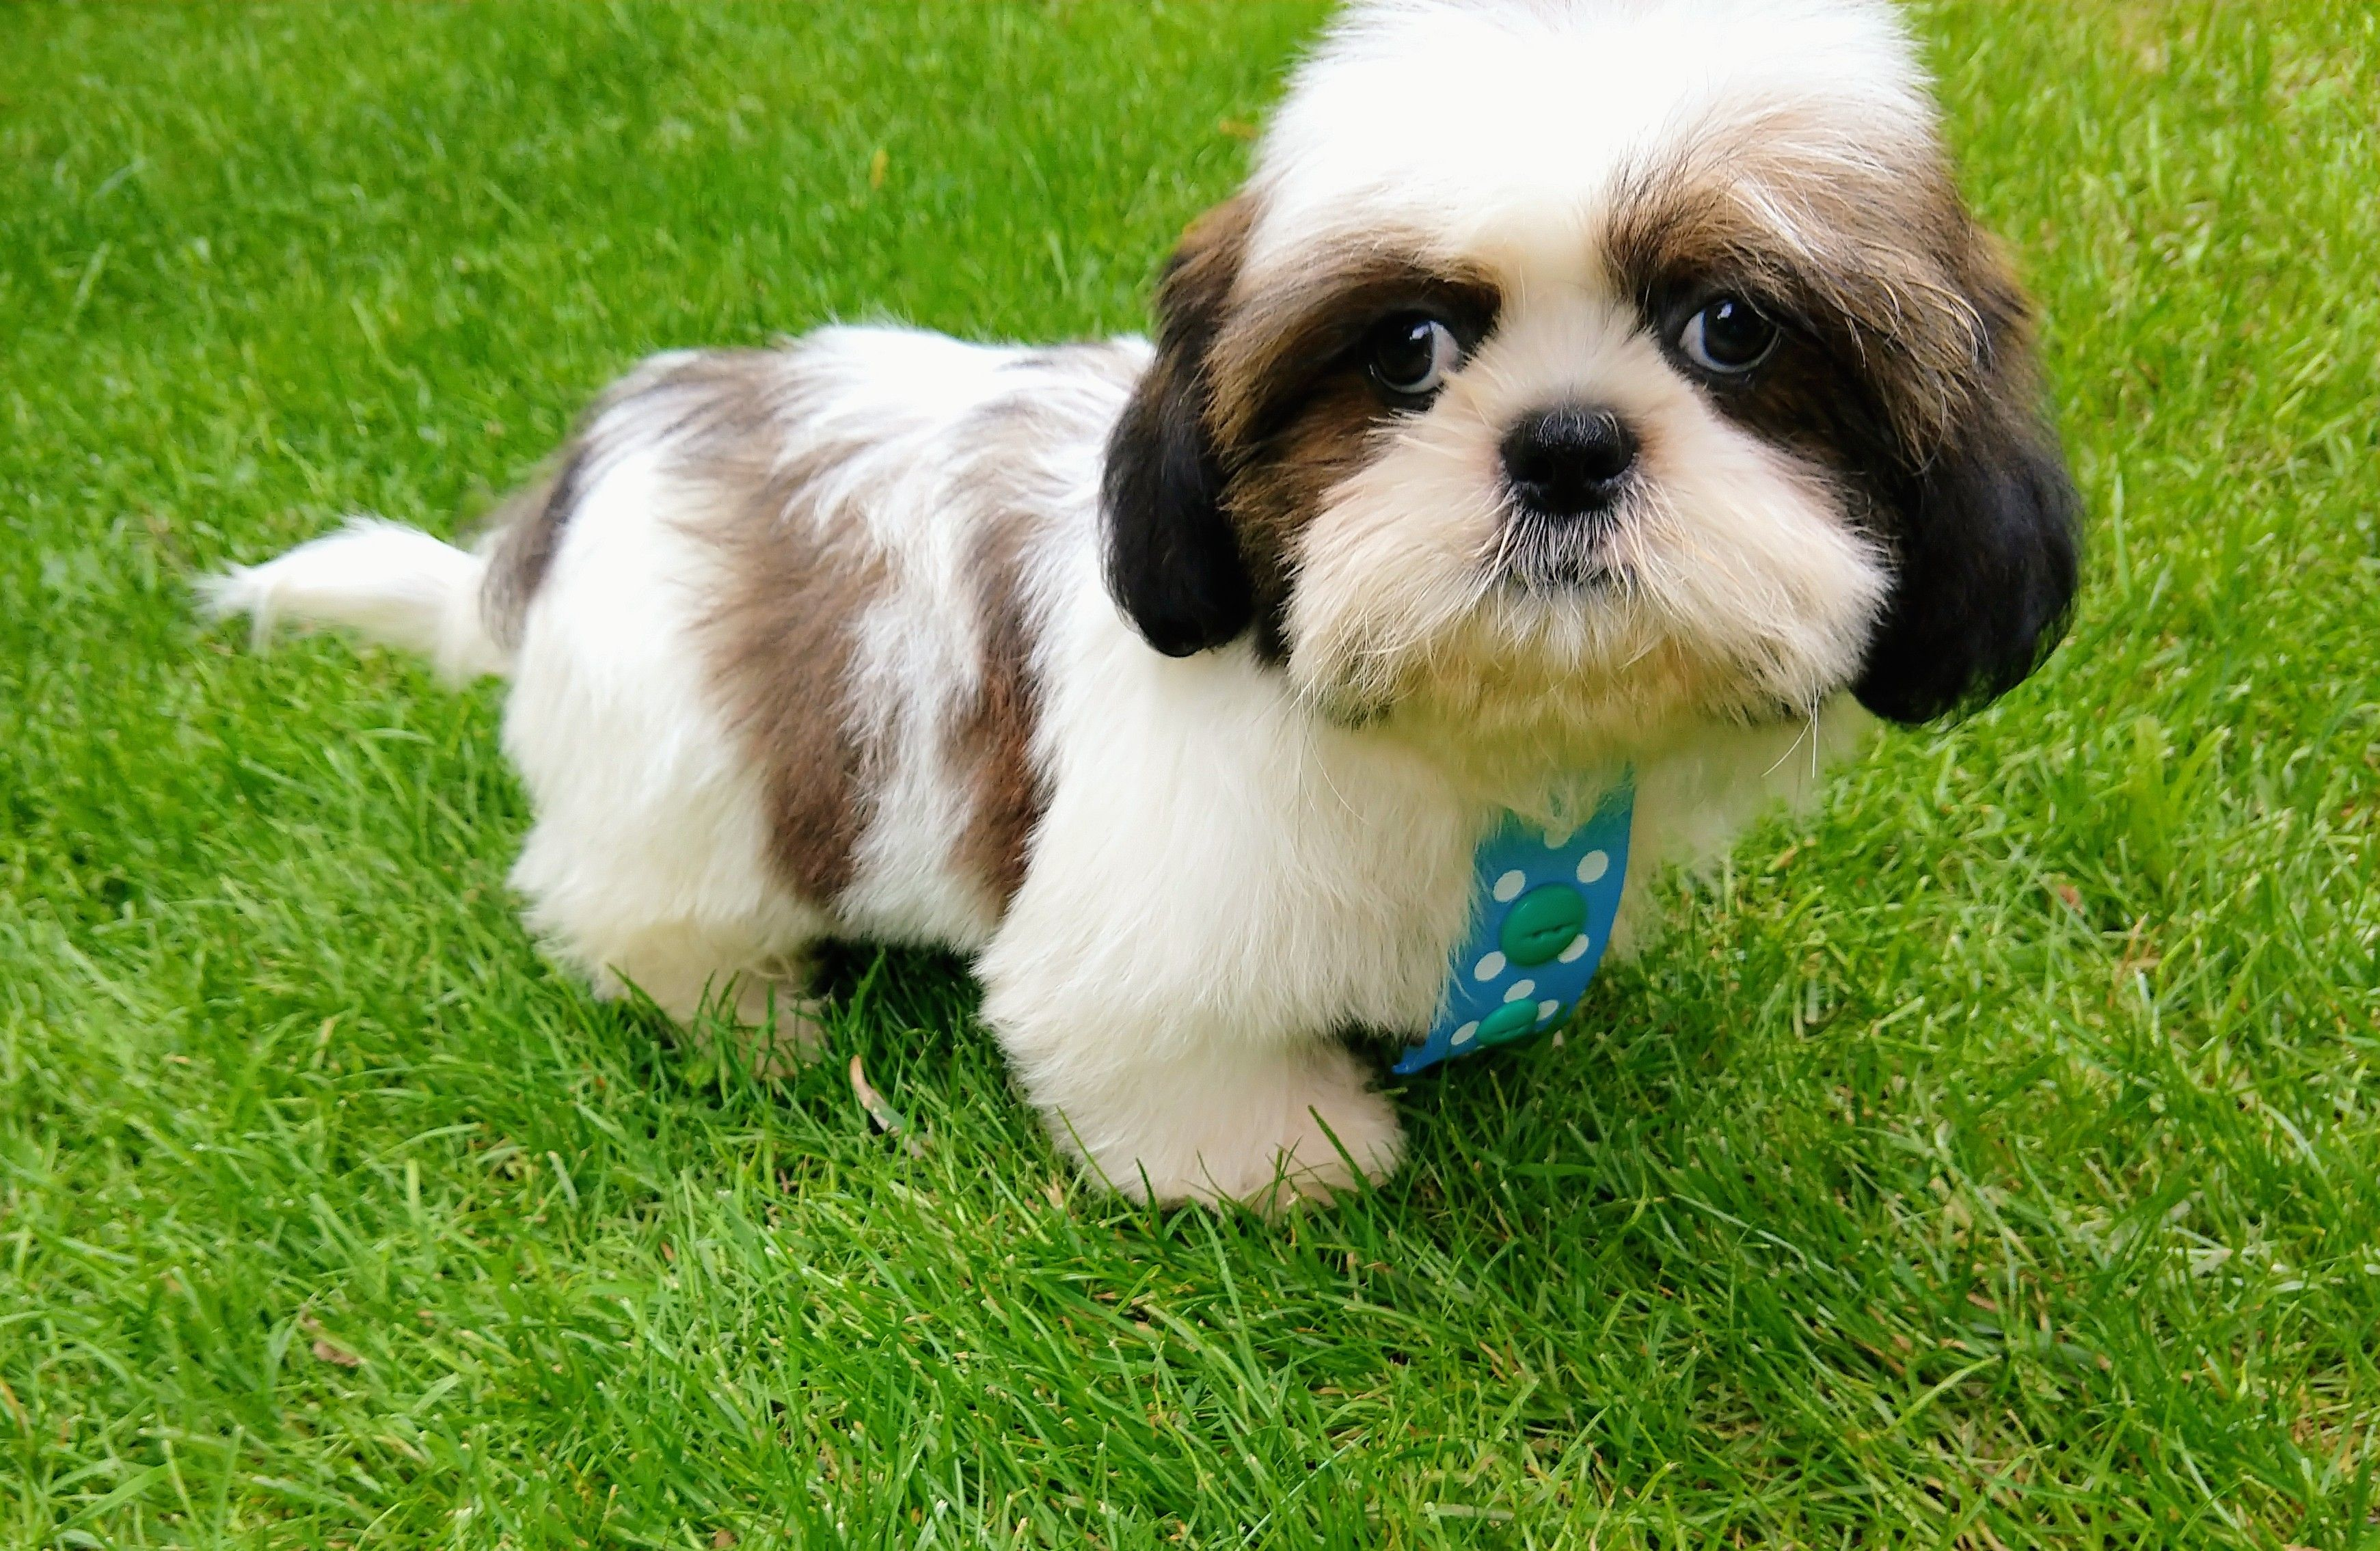 Adorable Shih Tzu Boy In Shelton Ct Shih Tzu Puppy Shih Tzu Puppies For Sale